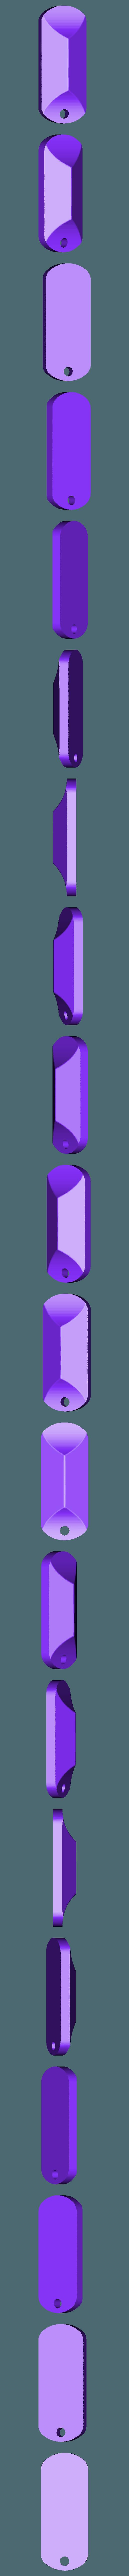 Primal_Pendant.stl Download free STL file Primal Pendant • Object to 3D print, TarFox